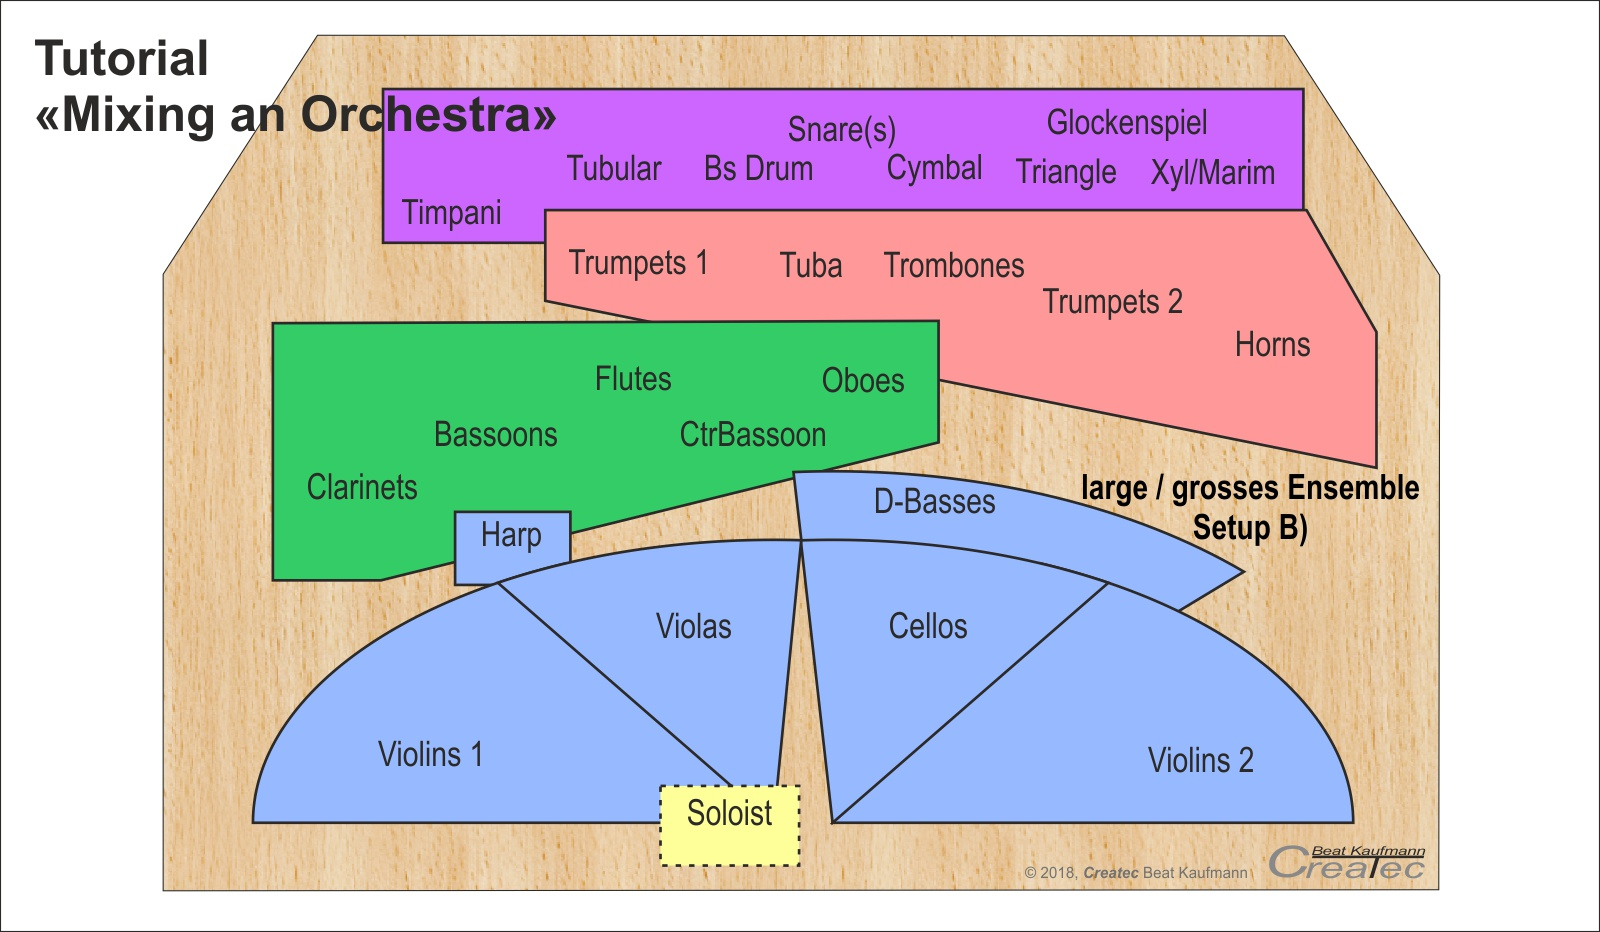 orchestra_setups6.jpg